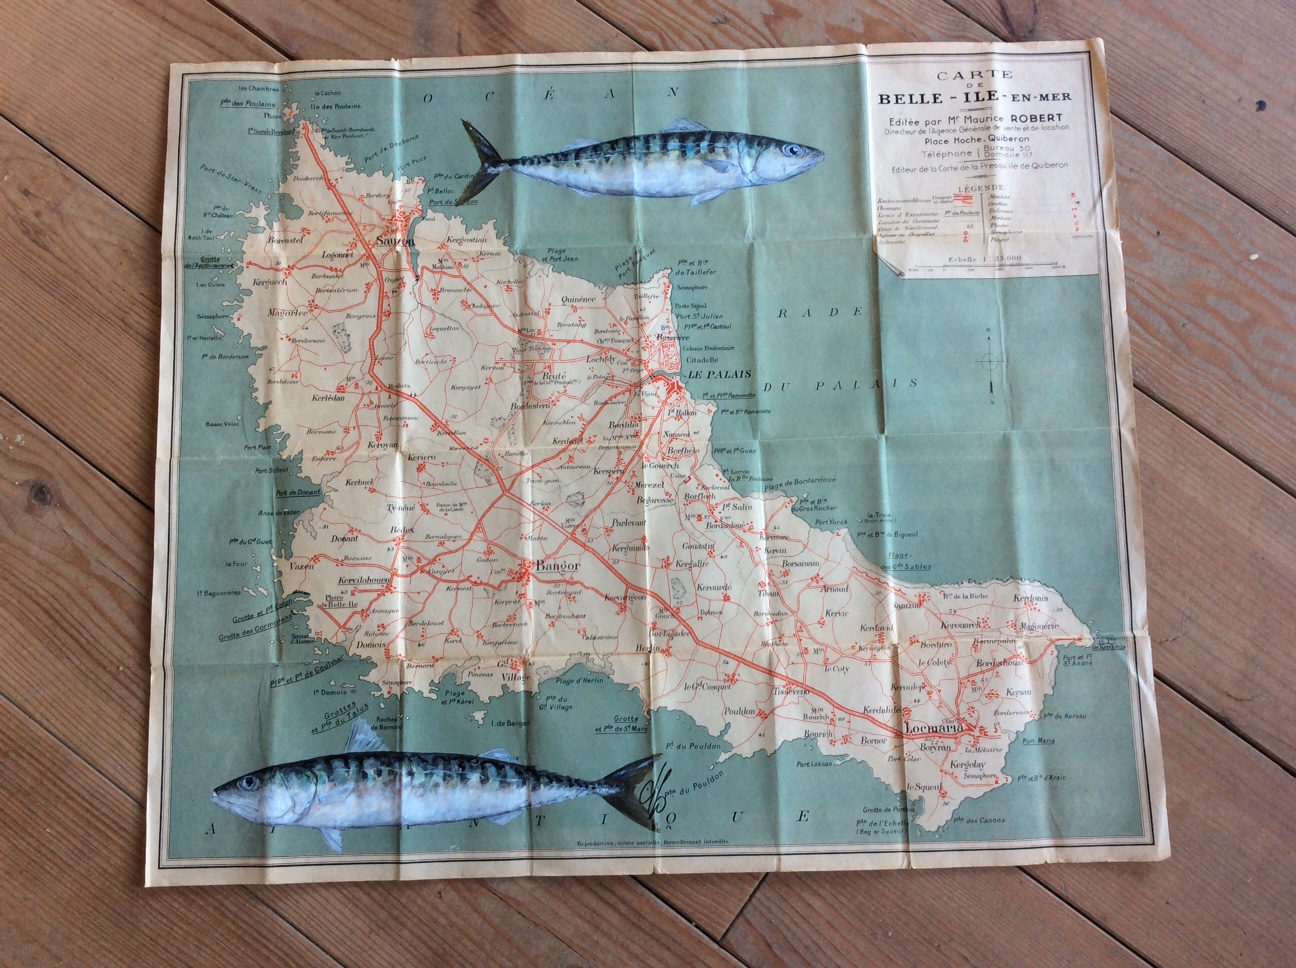 Carte touristique de Belle Ile